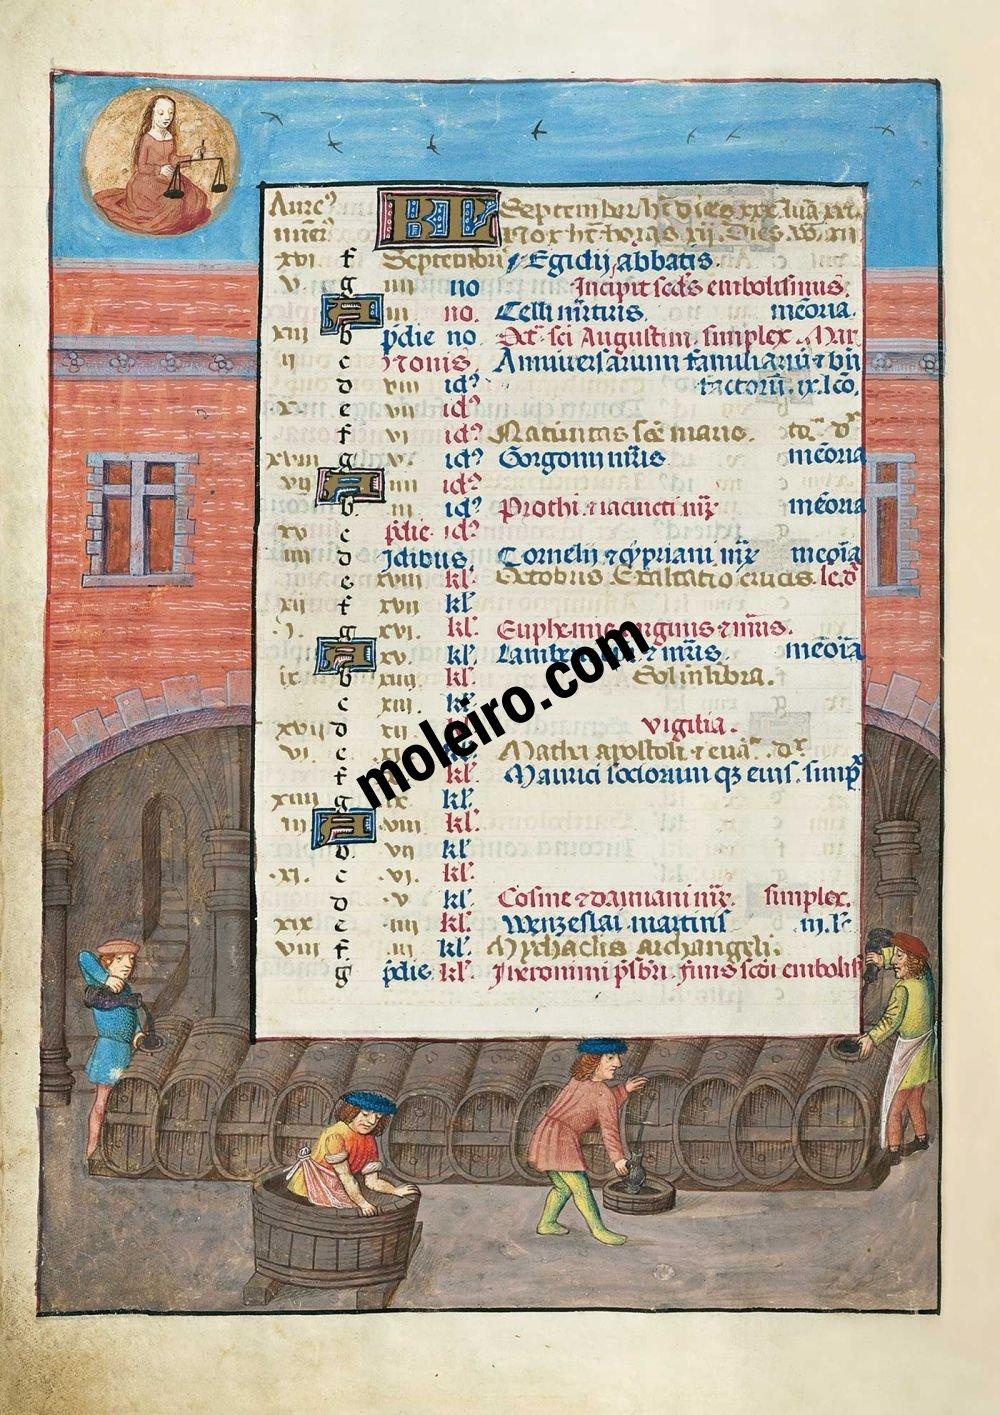 The Isabella Breviary f. 5v, September